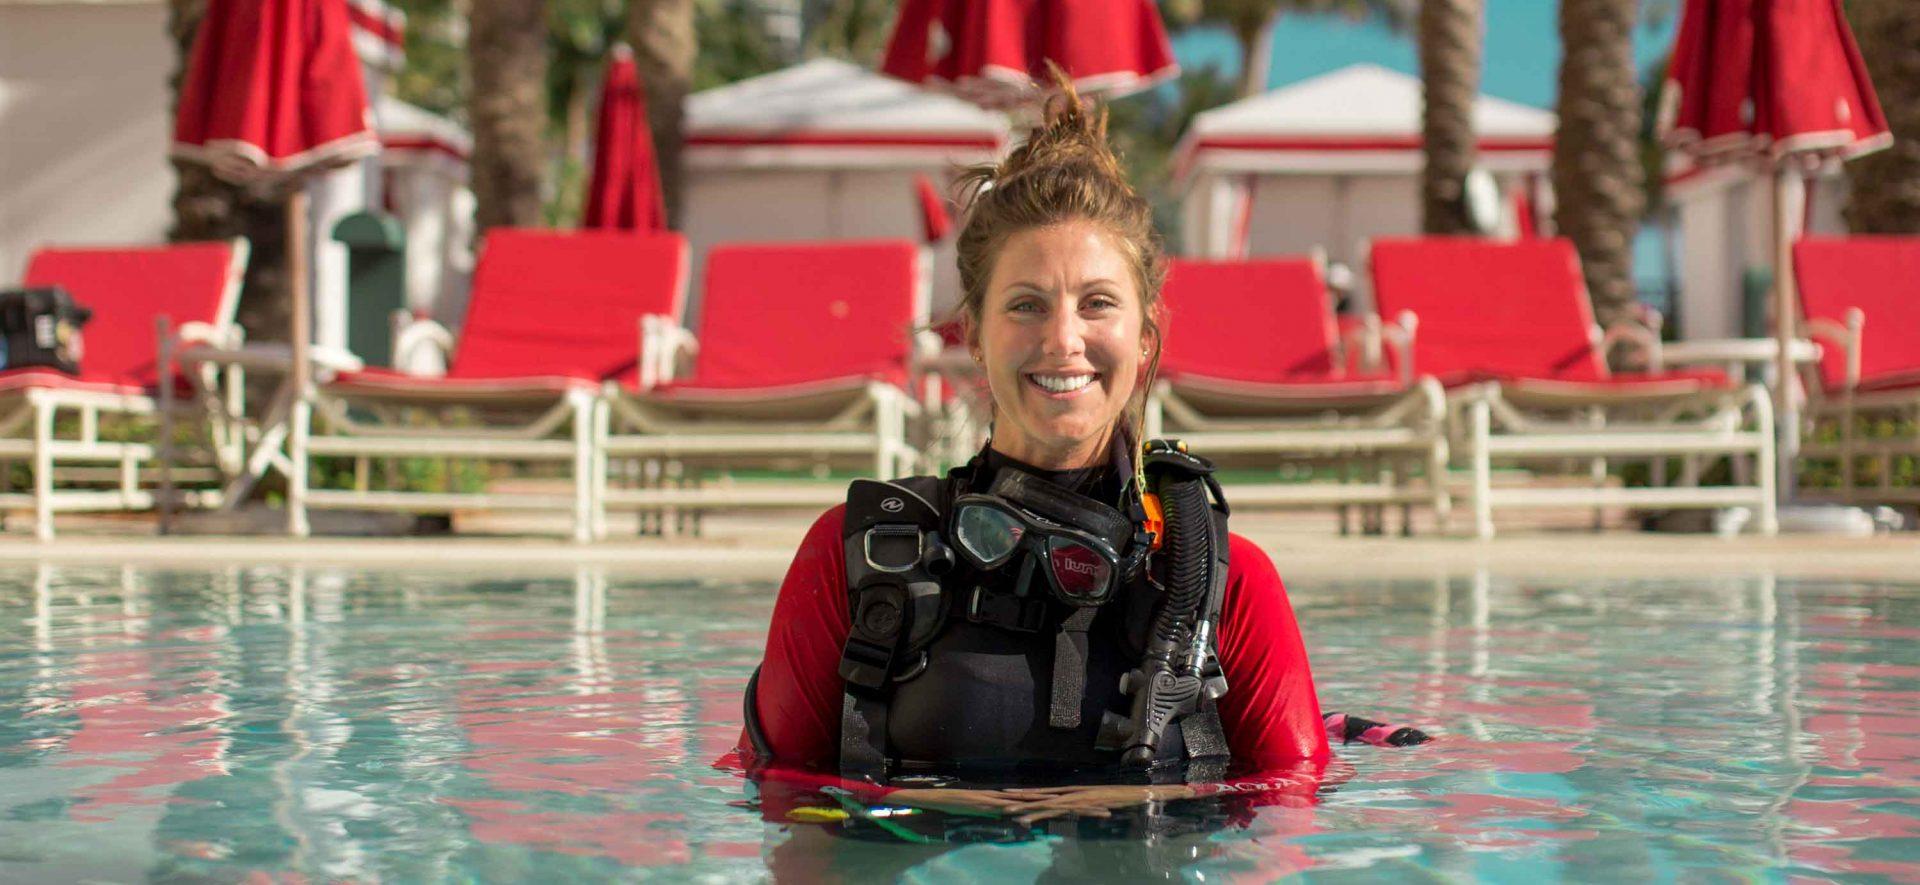 PADI scuba diving lessons with Squalo Divers in Miami, Florida.